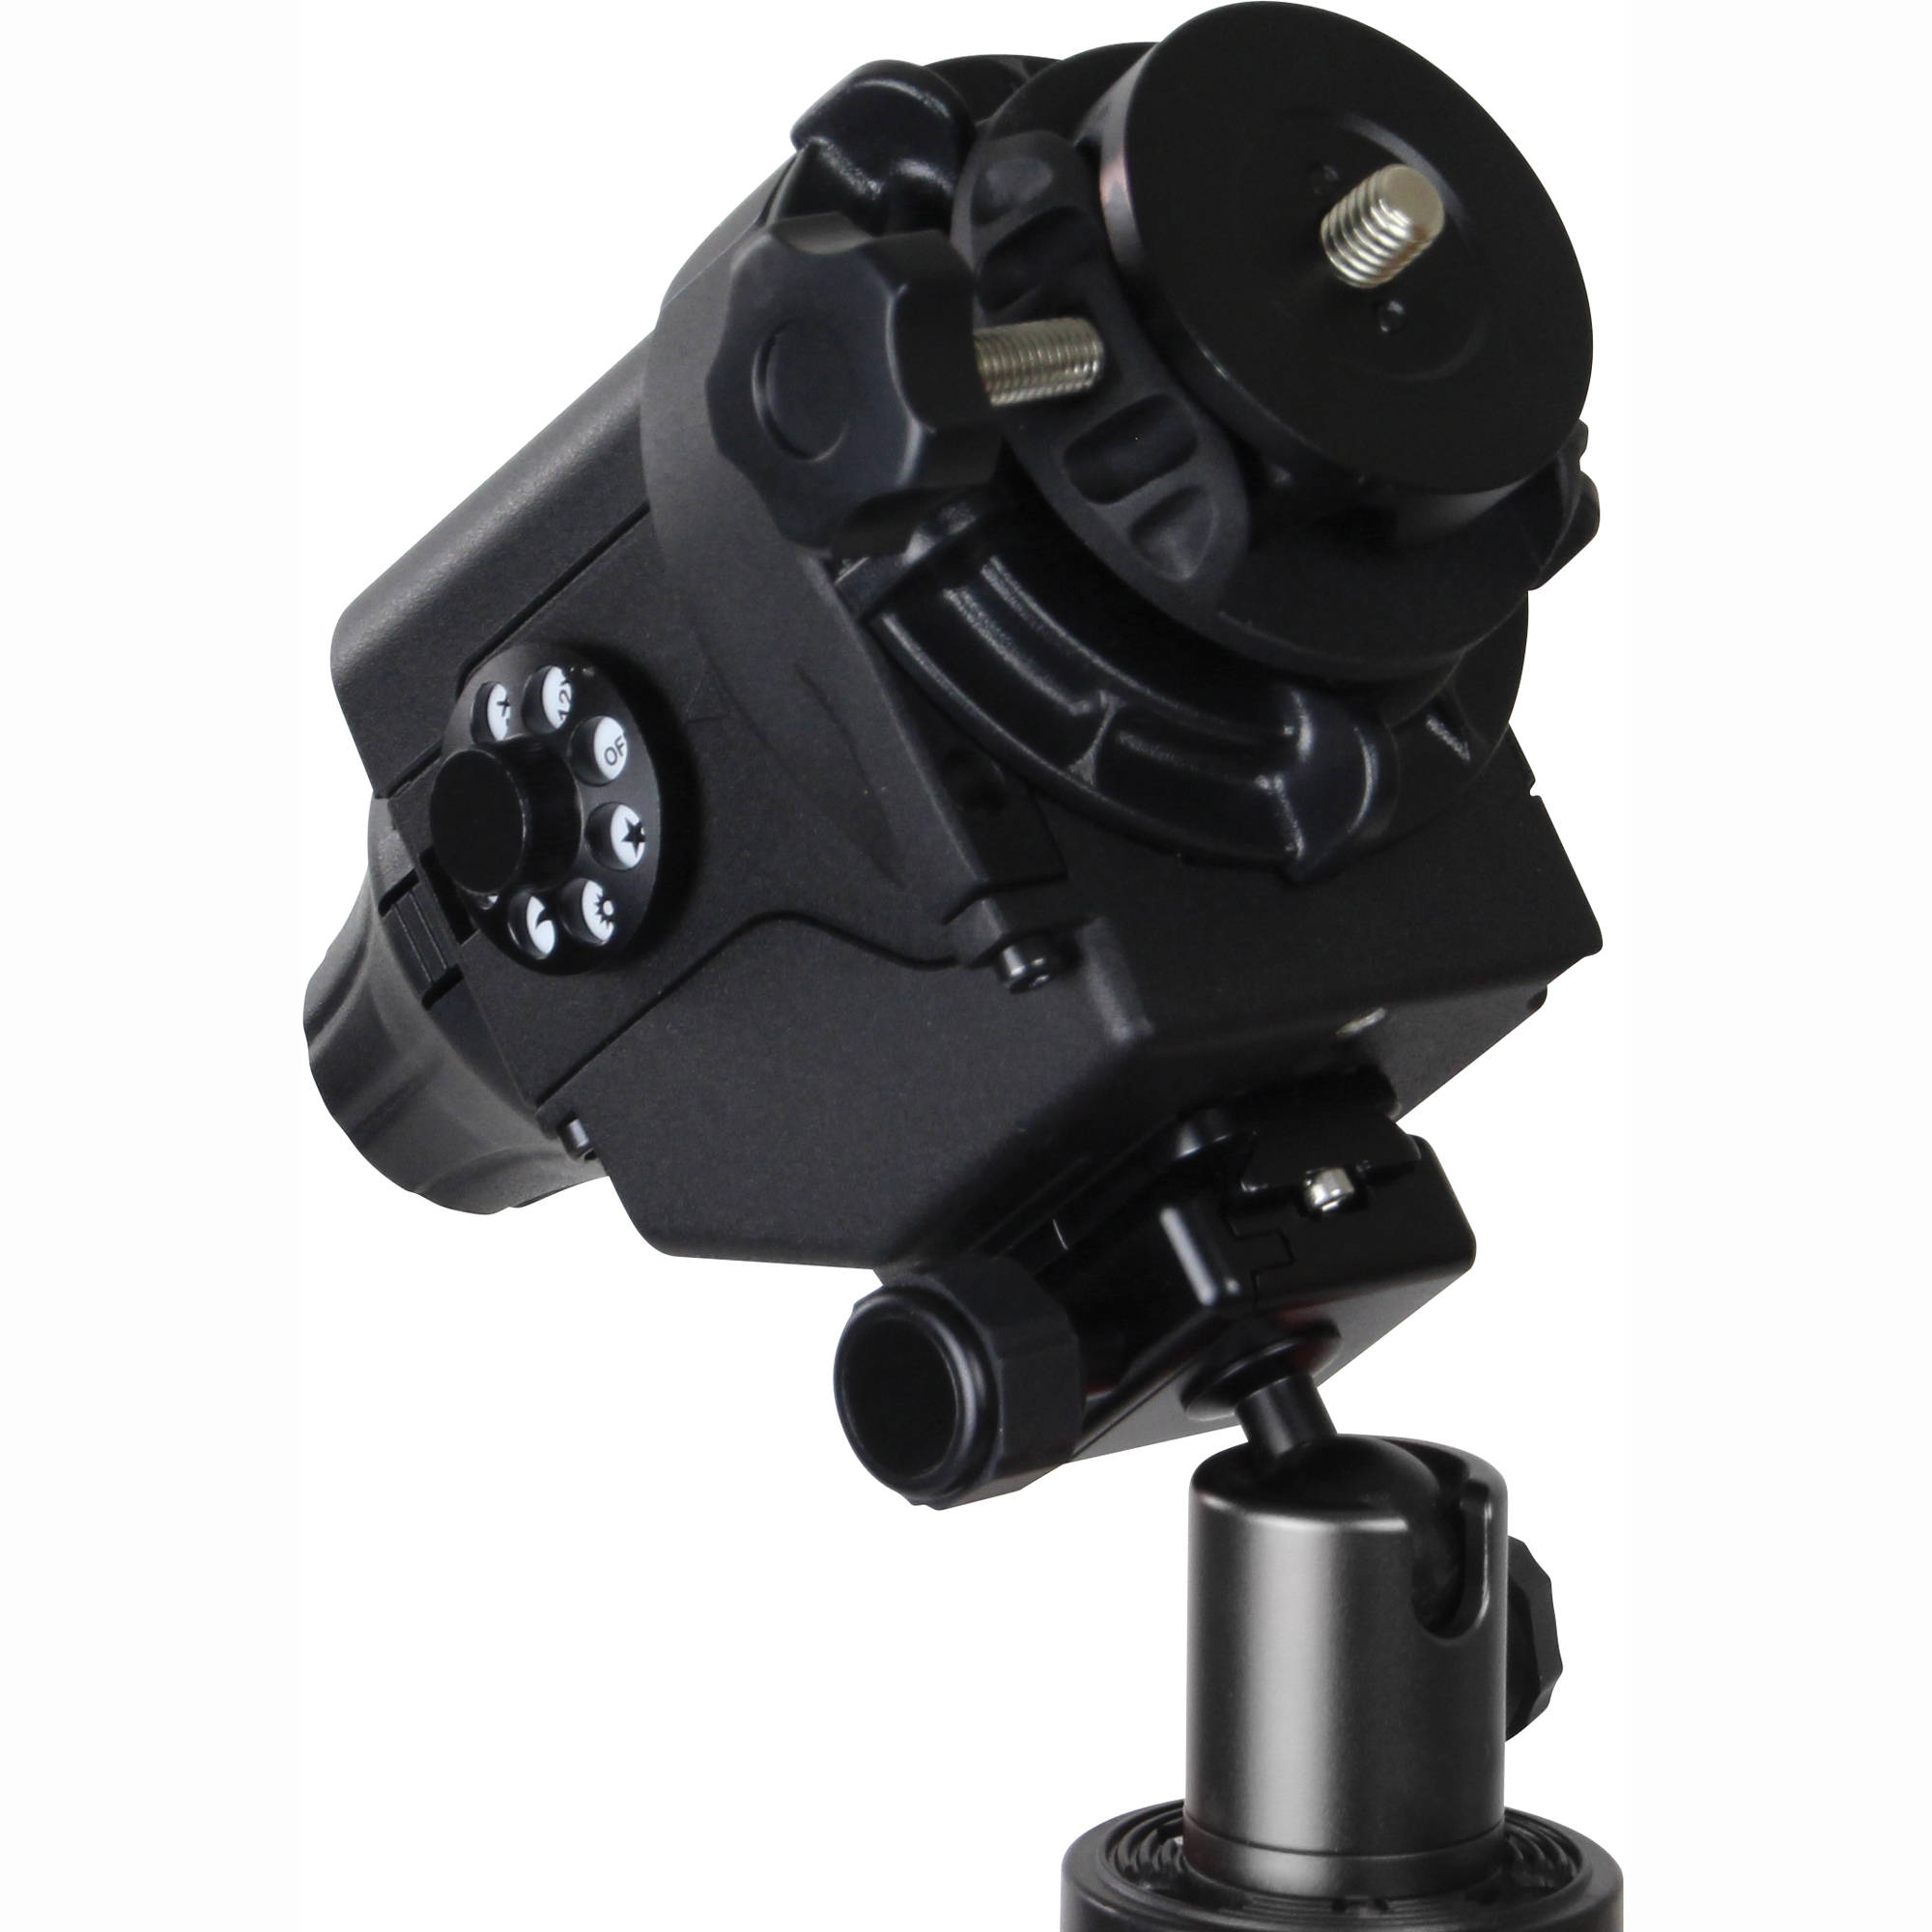 Sky watcher star adventurer motorized mount photo package for Motorized video camera mount